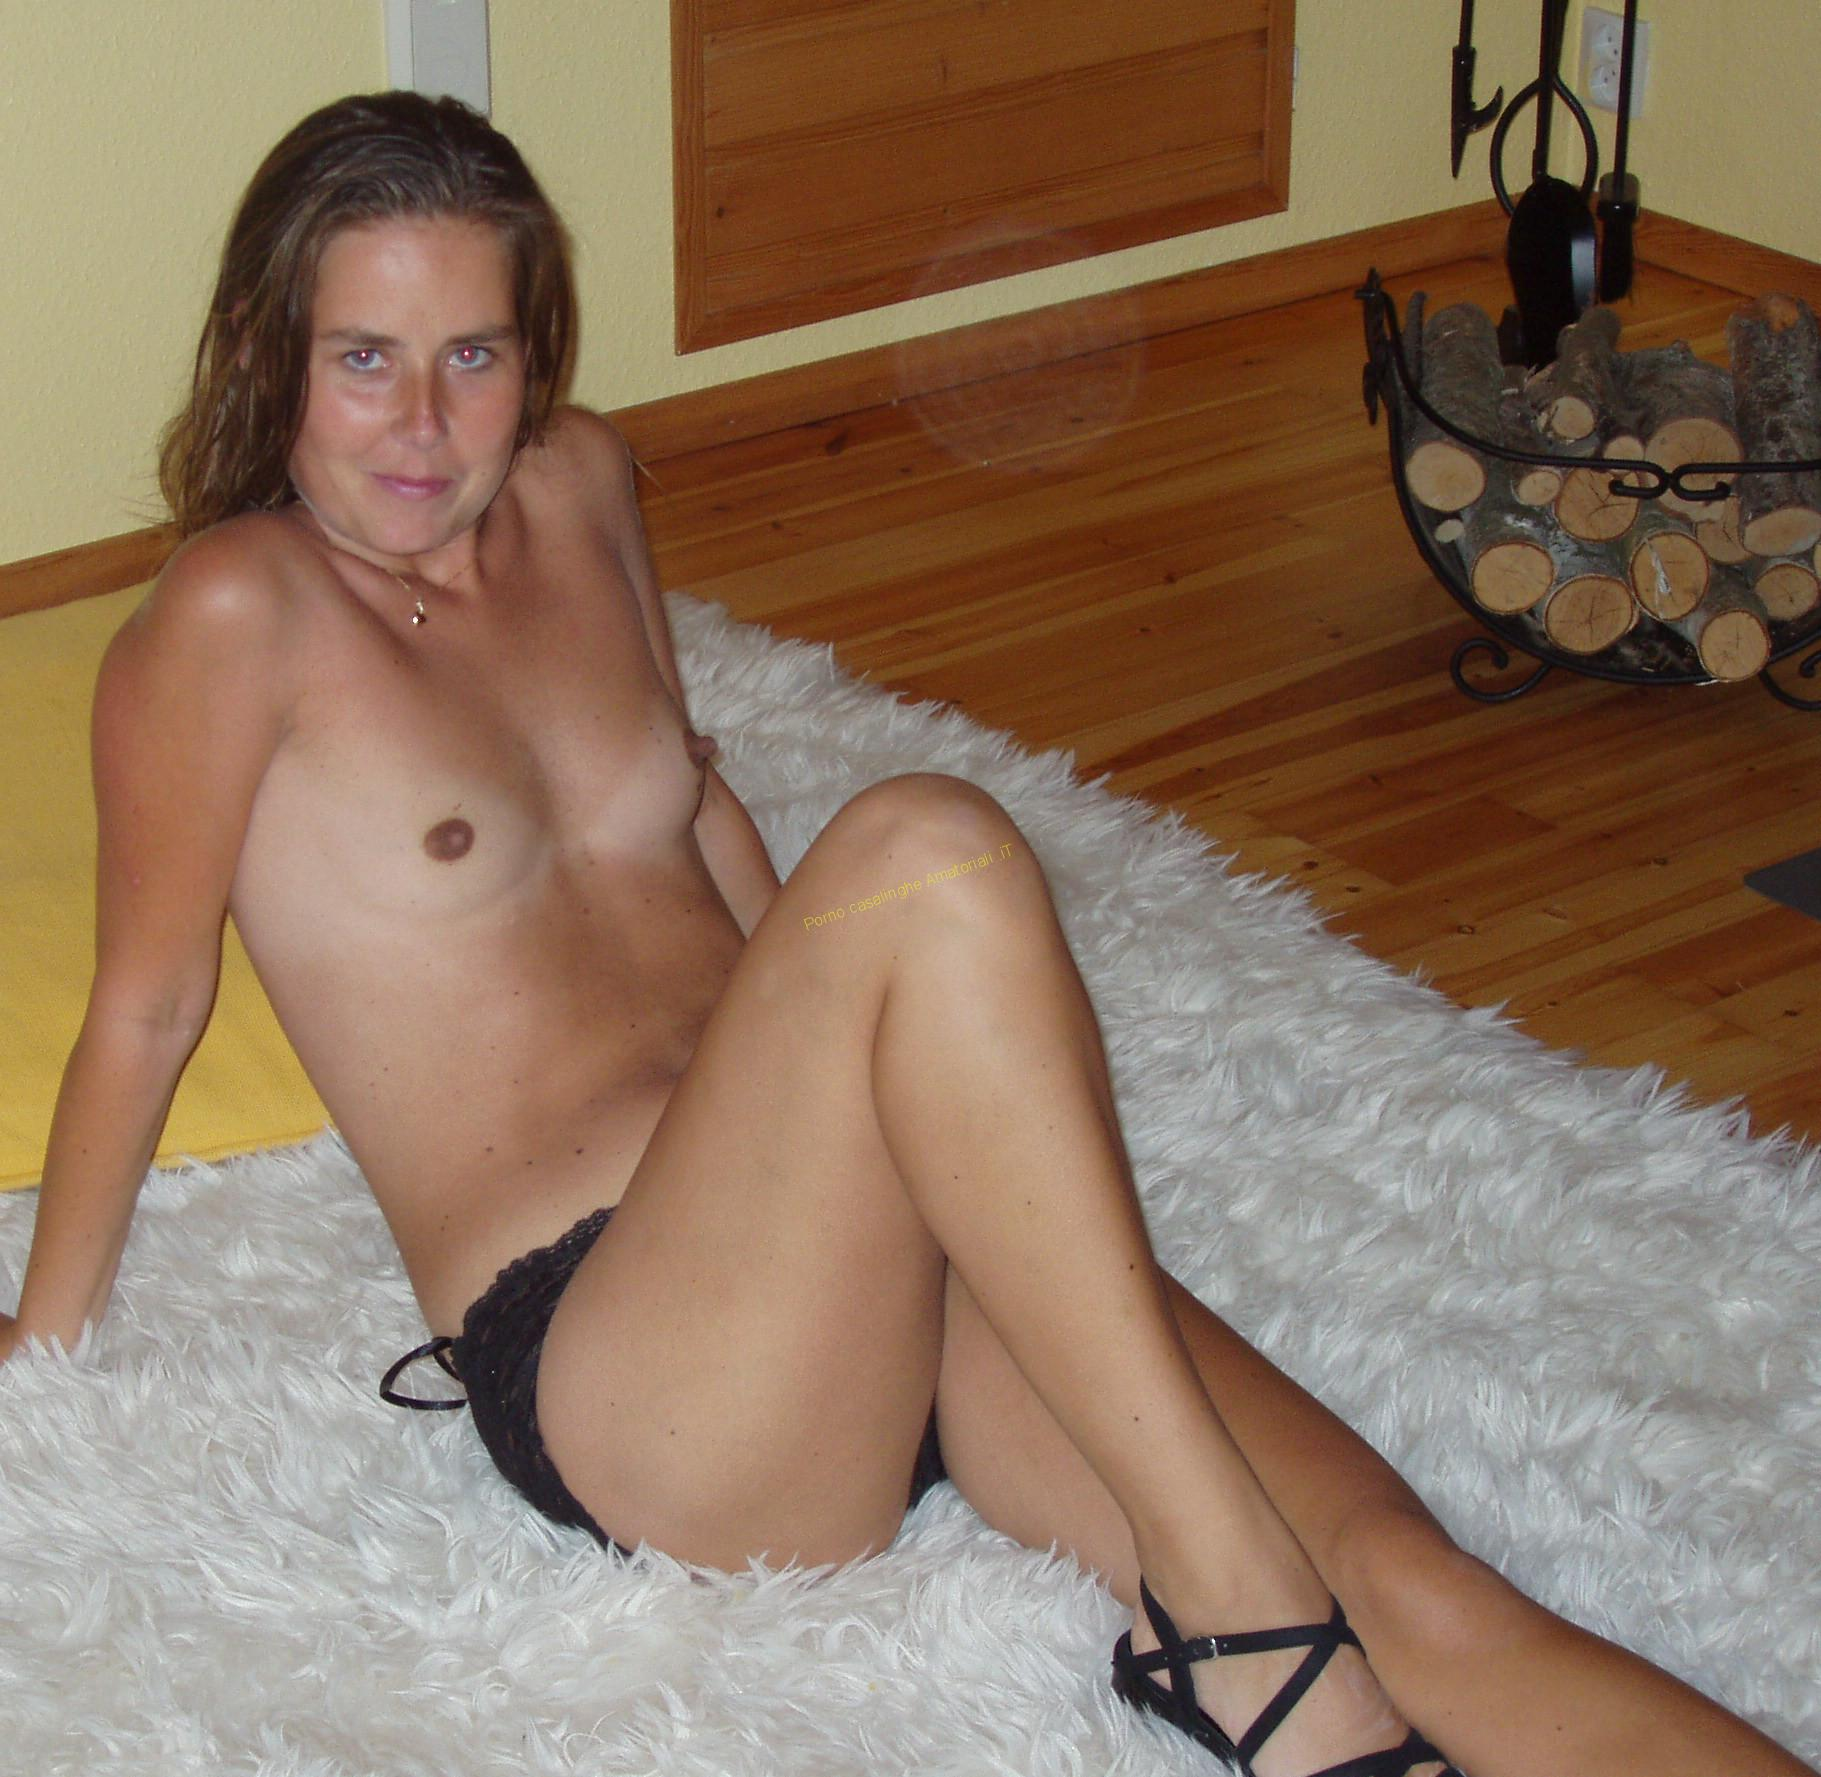 Fru boejning naken